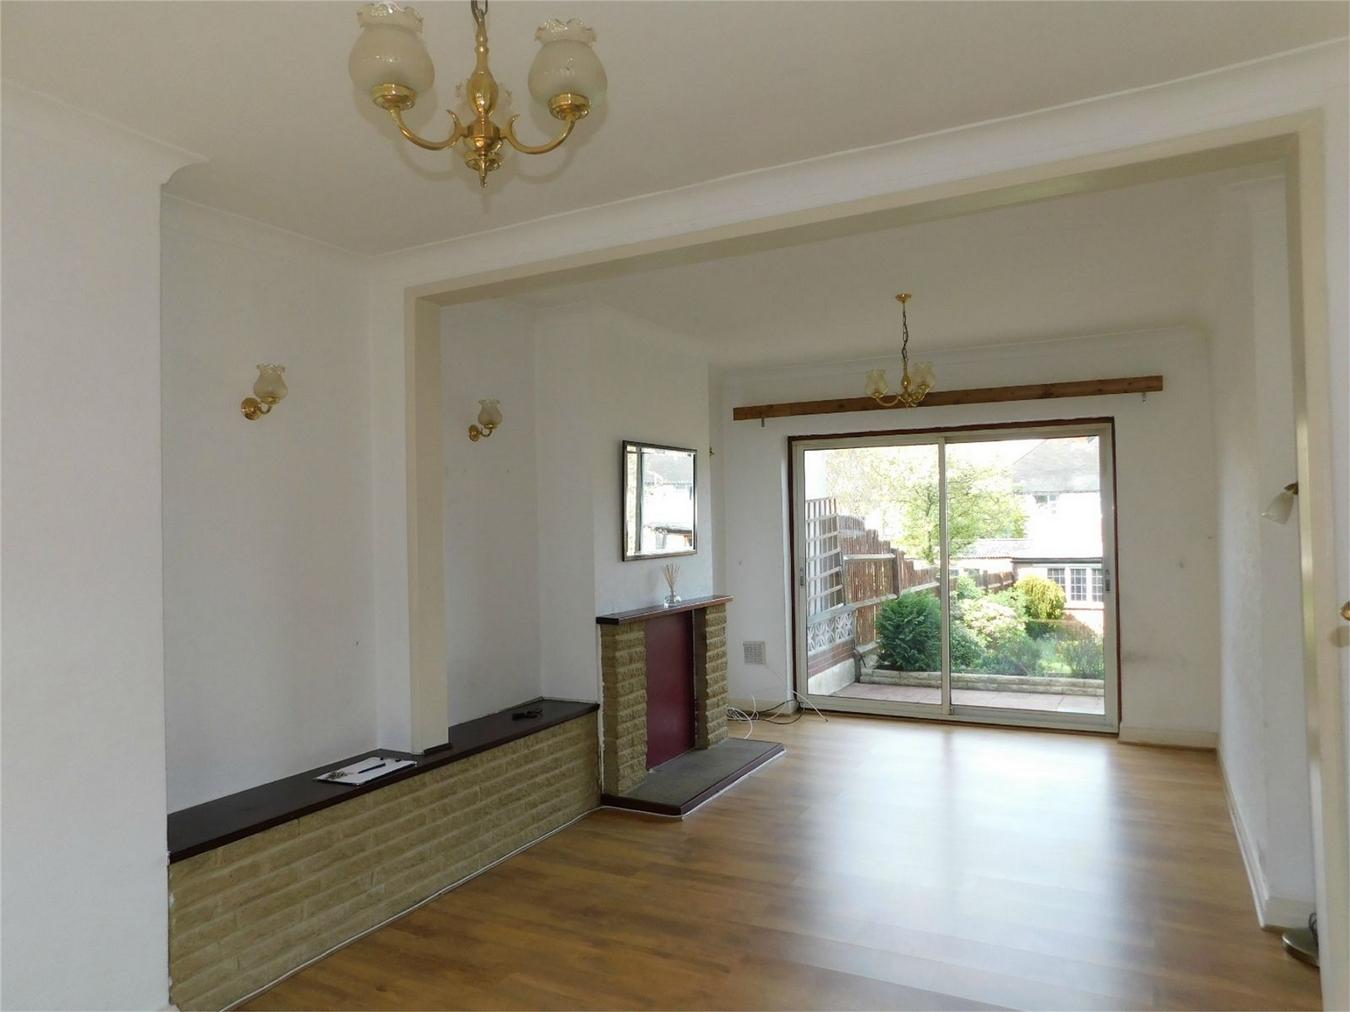 3 Bedroom Terraced House For Sale In Northolt